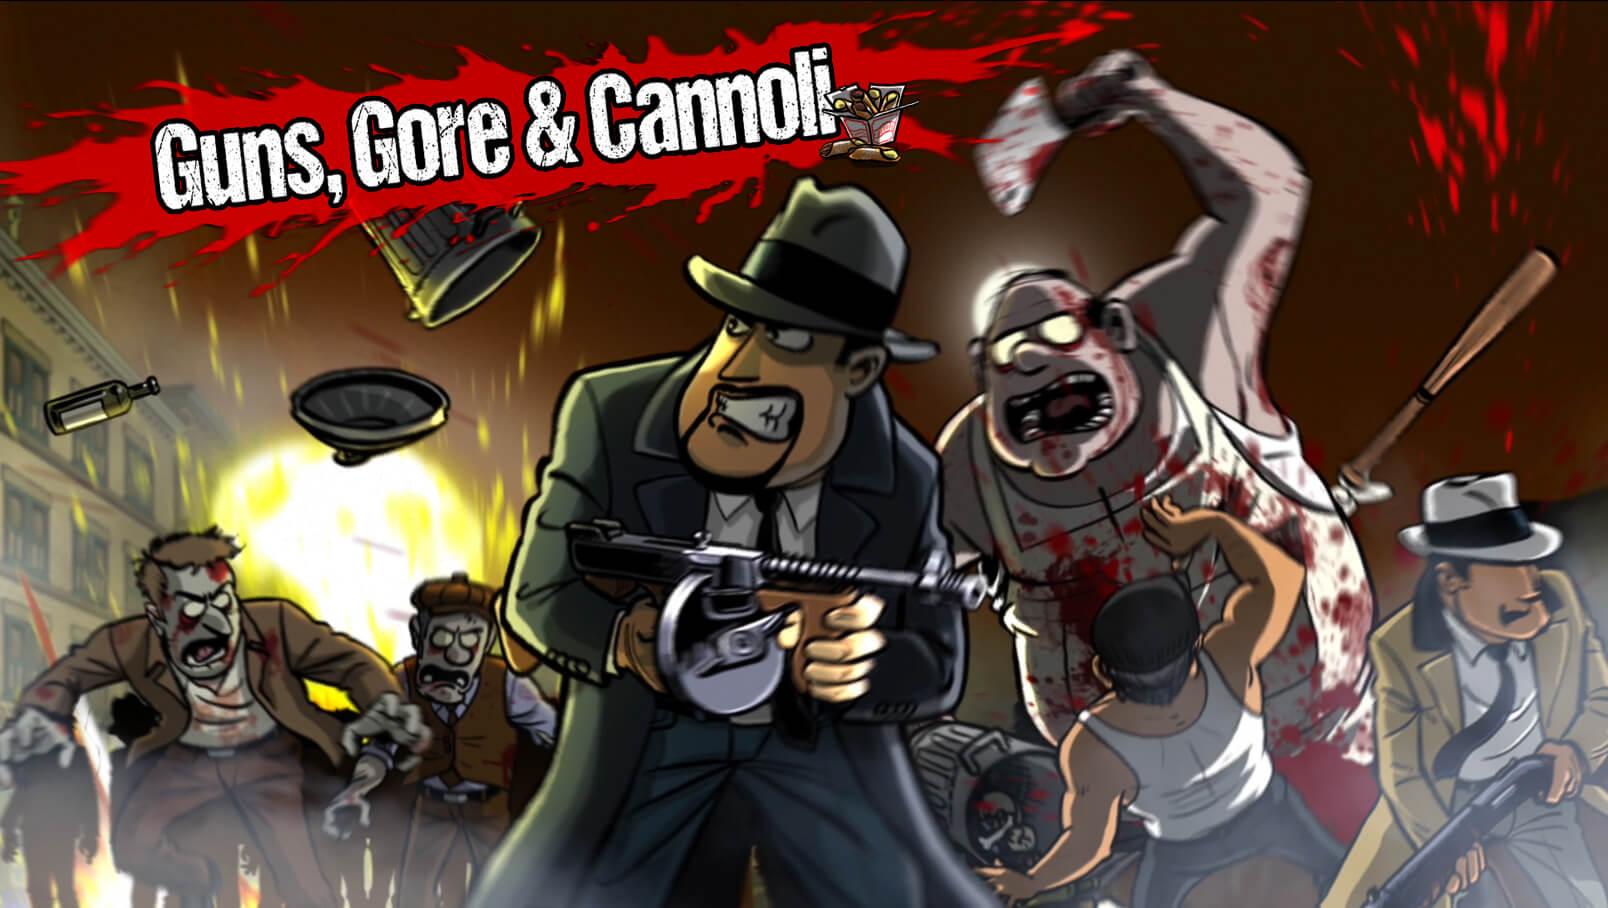 1608x908 > Guns, Gore & Cannoli Wallpapers